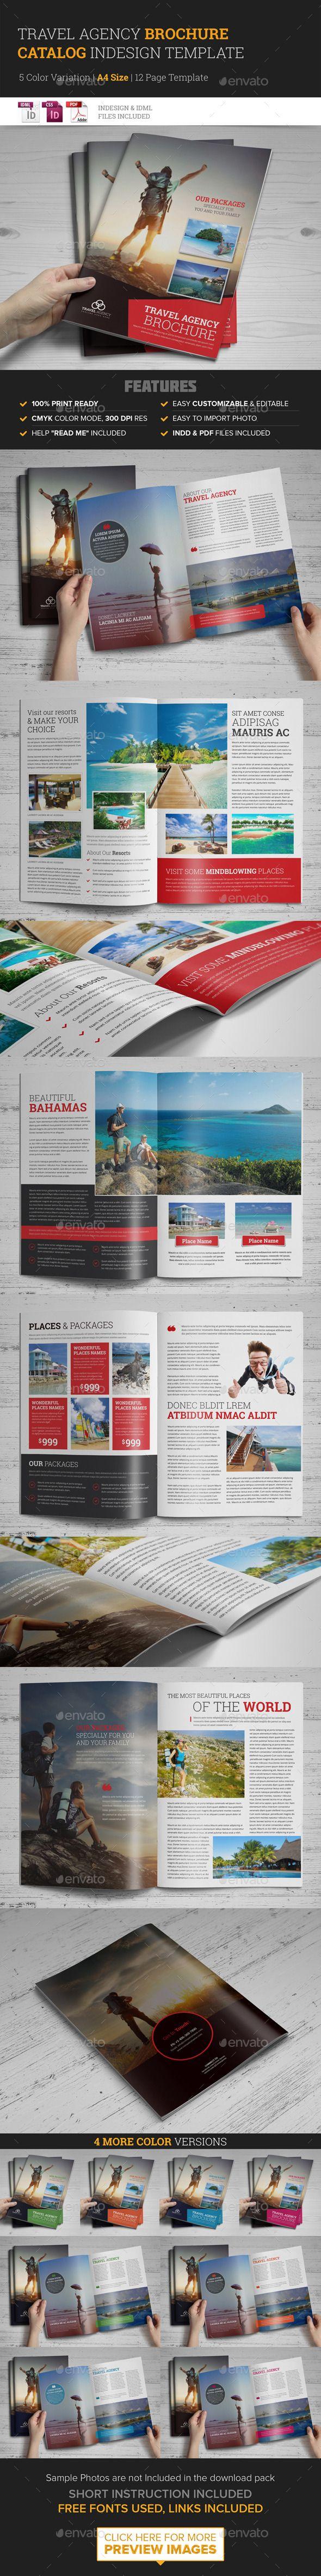 Travel Agency Brochure Catalog InDesign Template 2 - Corporate Brochures